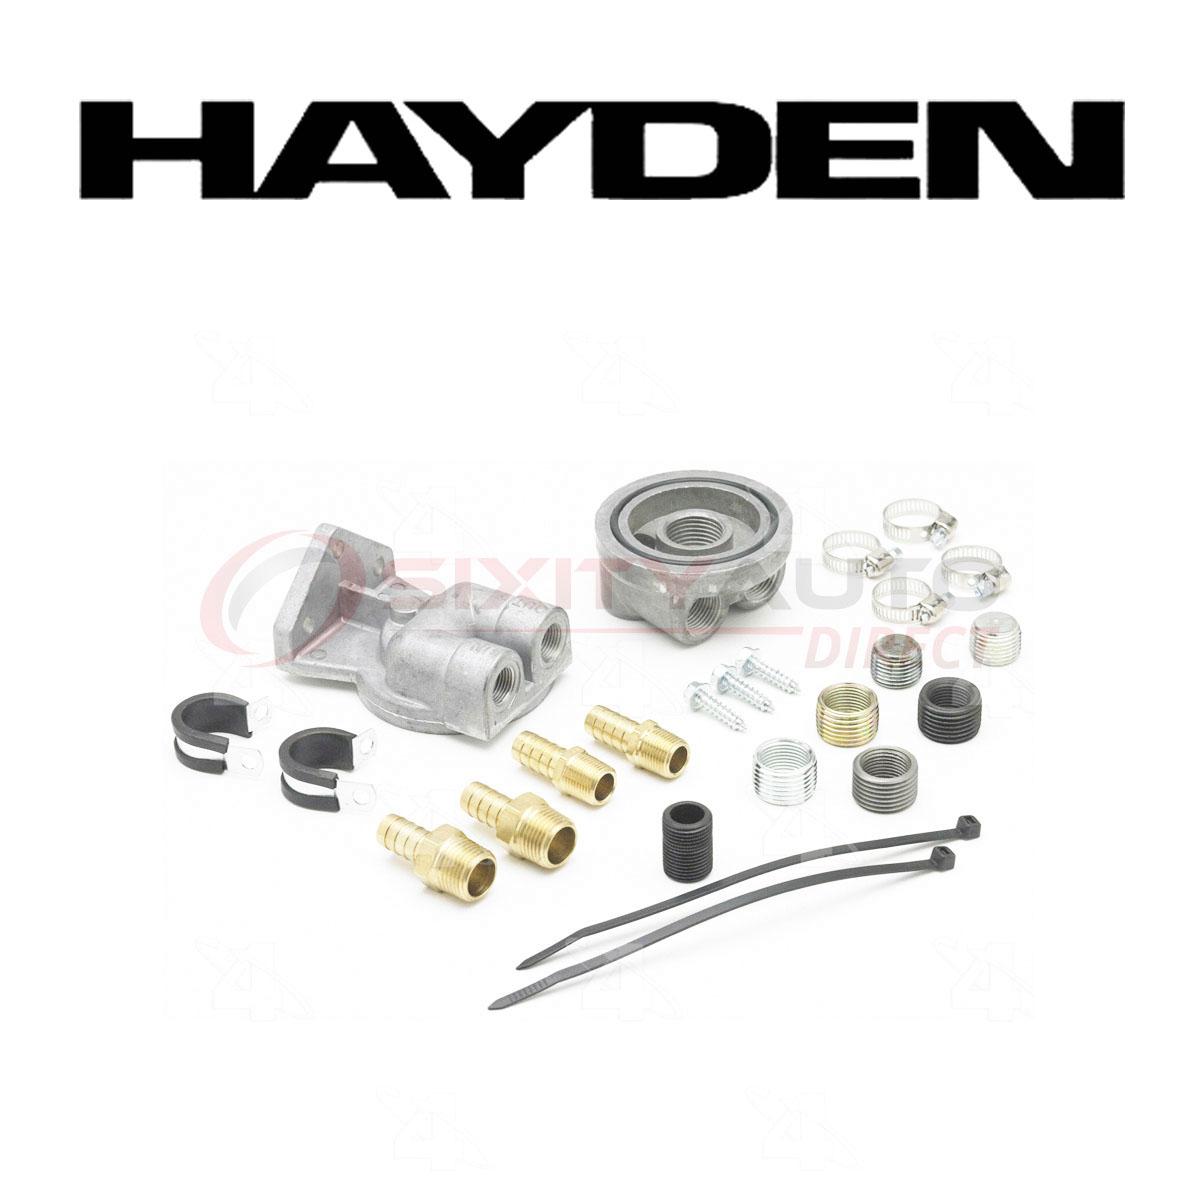 Hayden Oil Filter Remote Mounting Kit for 2015 Subaru XV